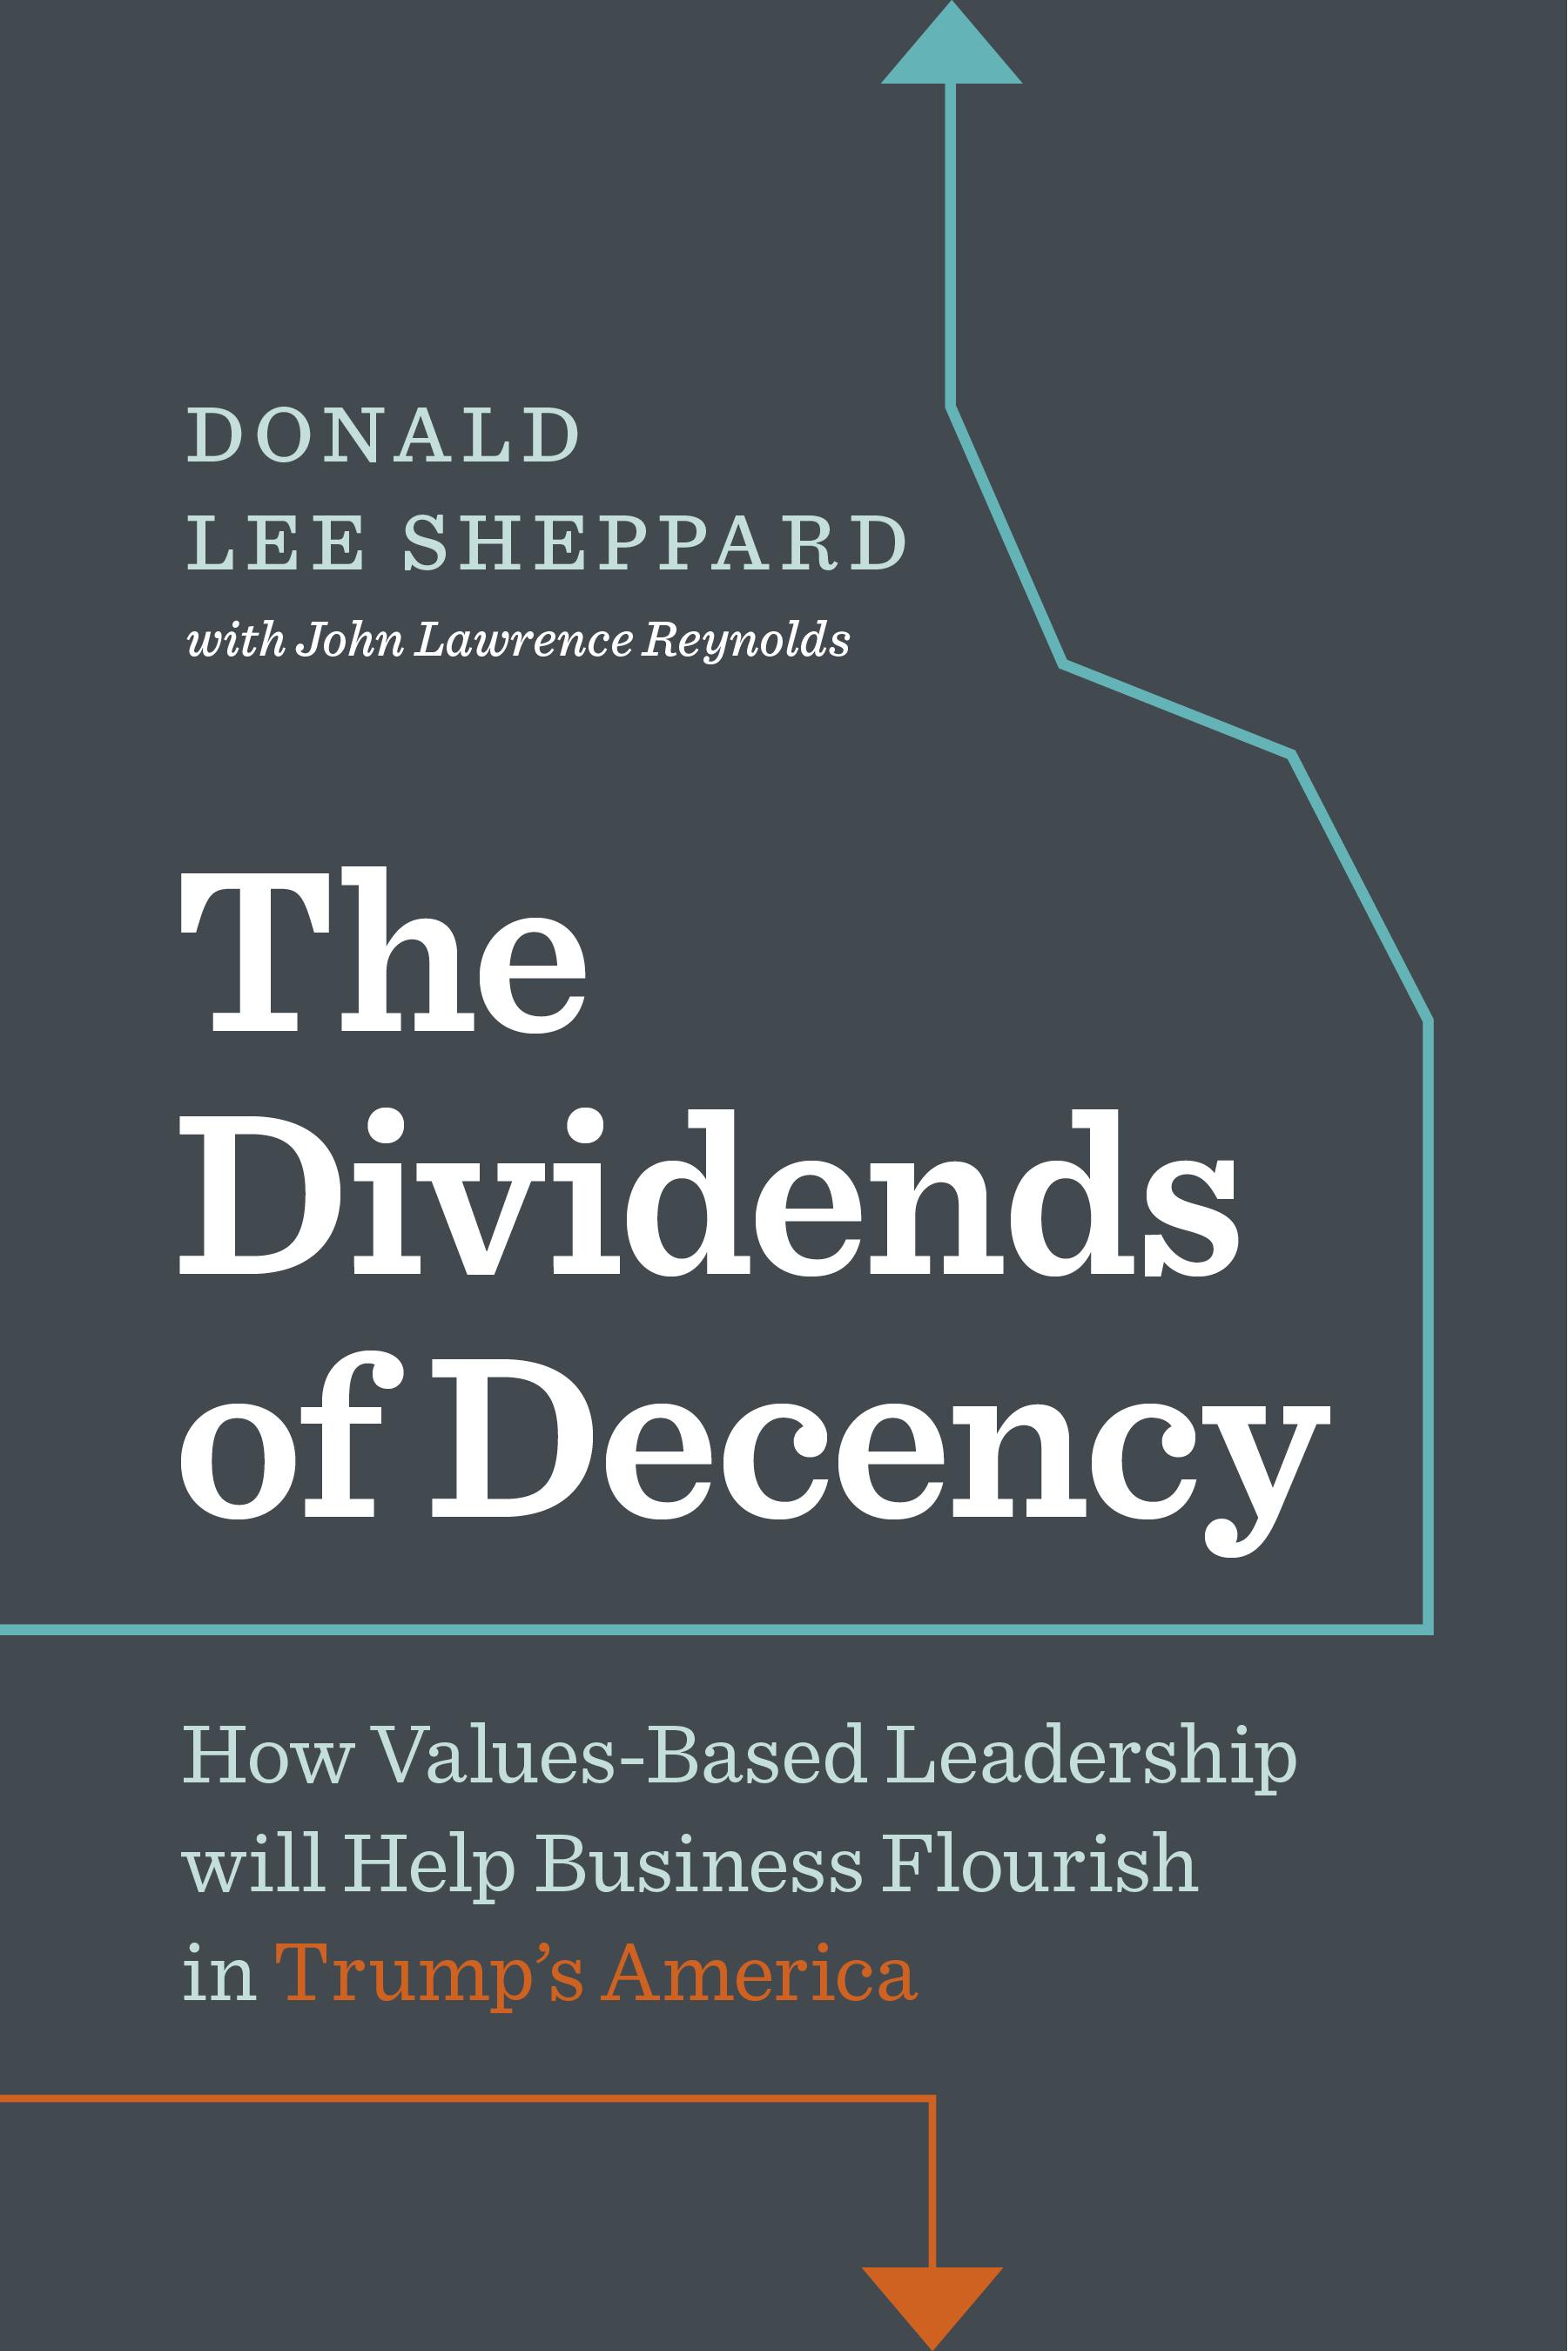 Dividends of Decency Cover.jpg